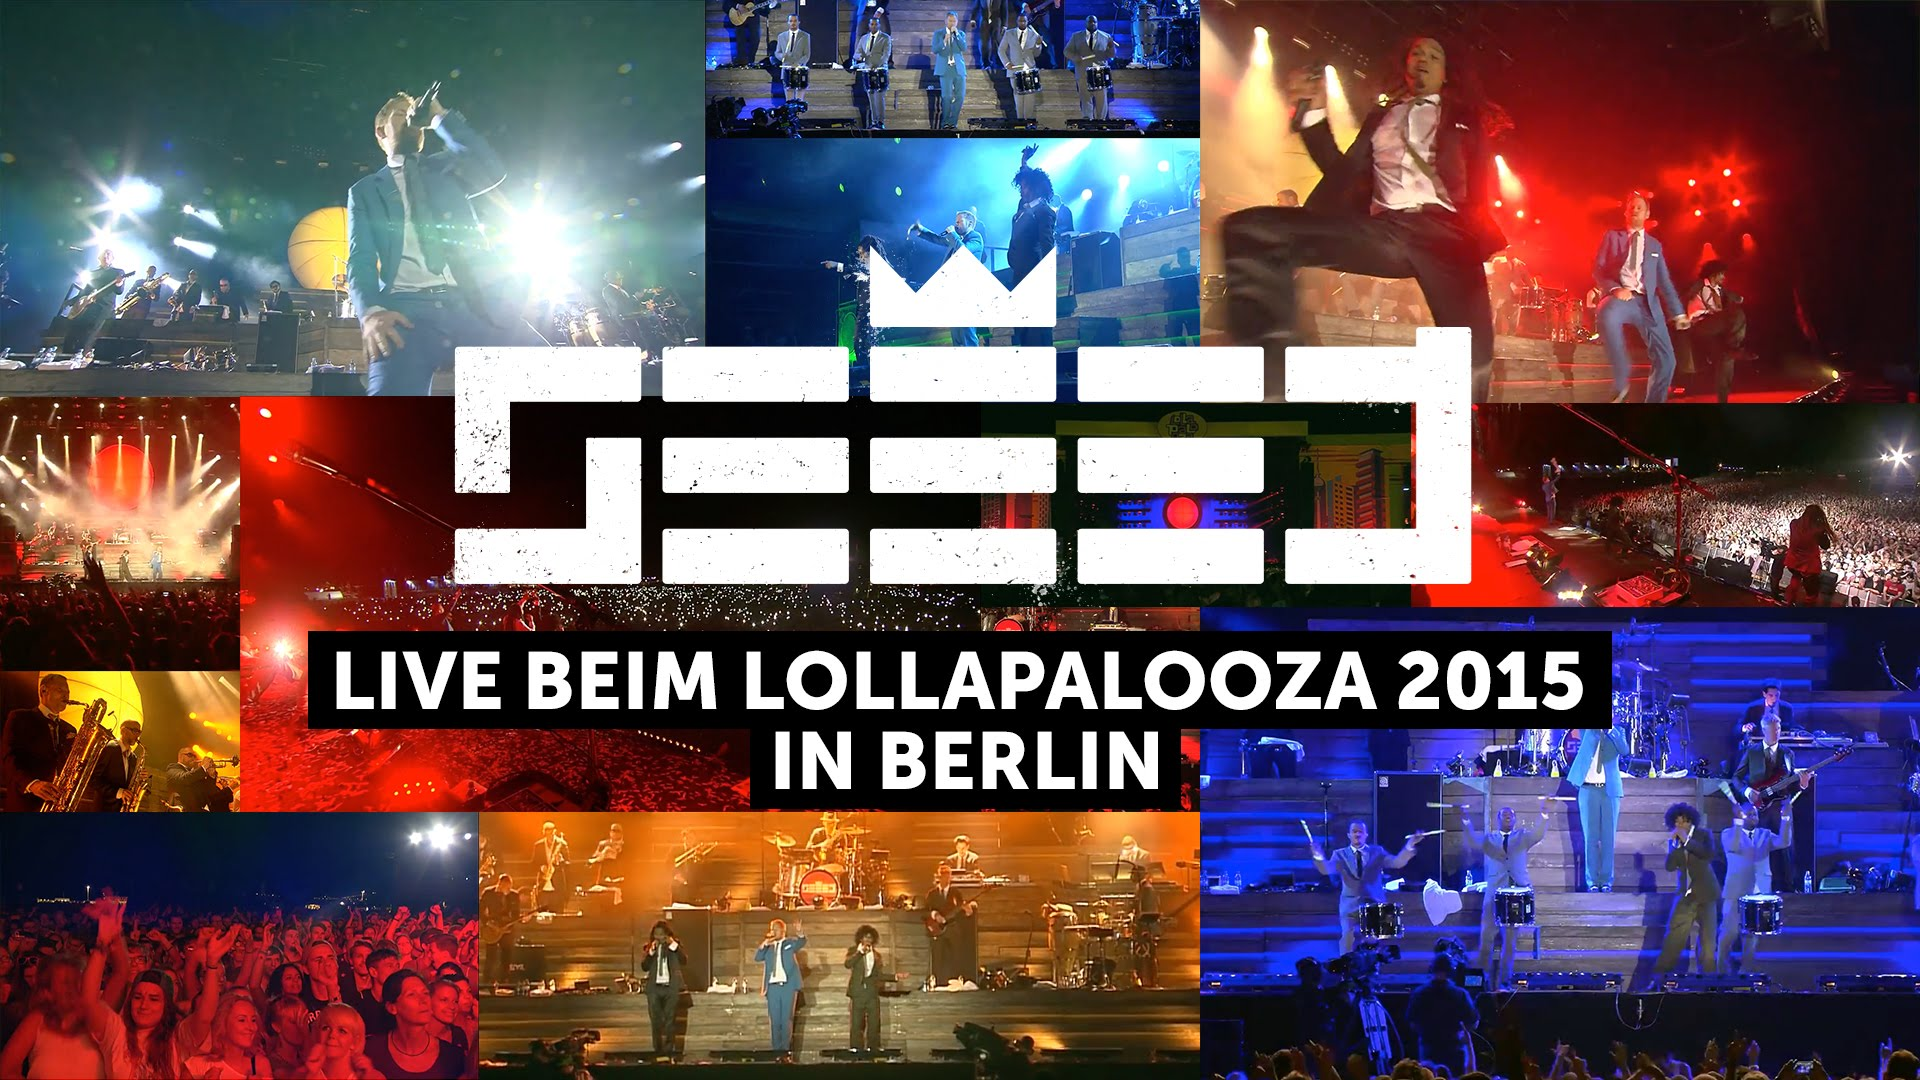 Seeed @ Lollapalooza Berlin 2015 (Full Show) [9/13/2015]